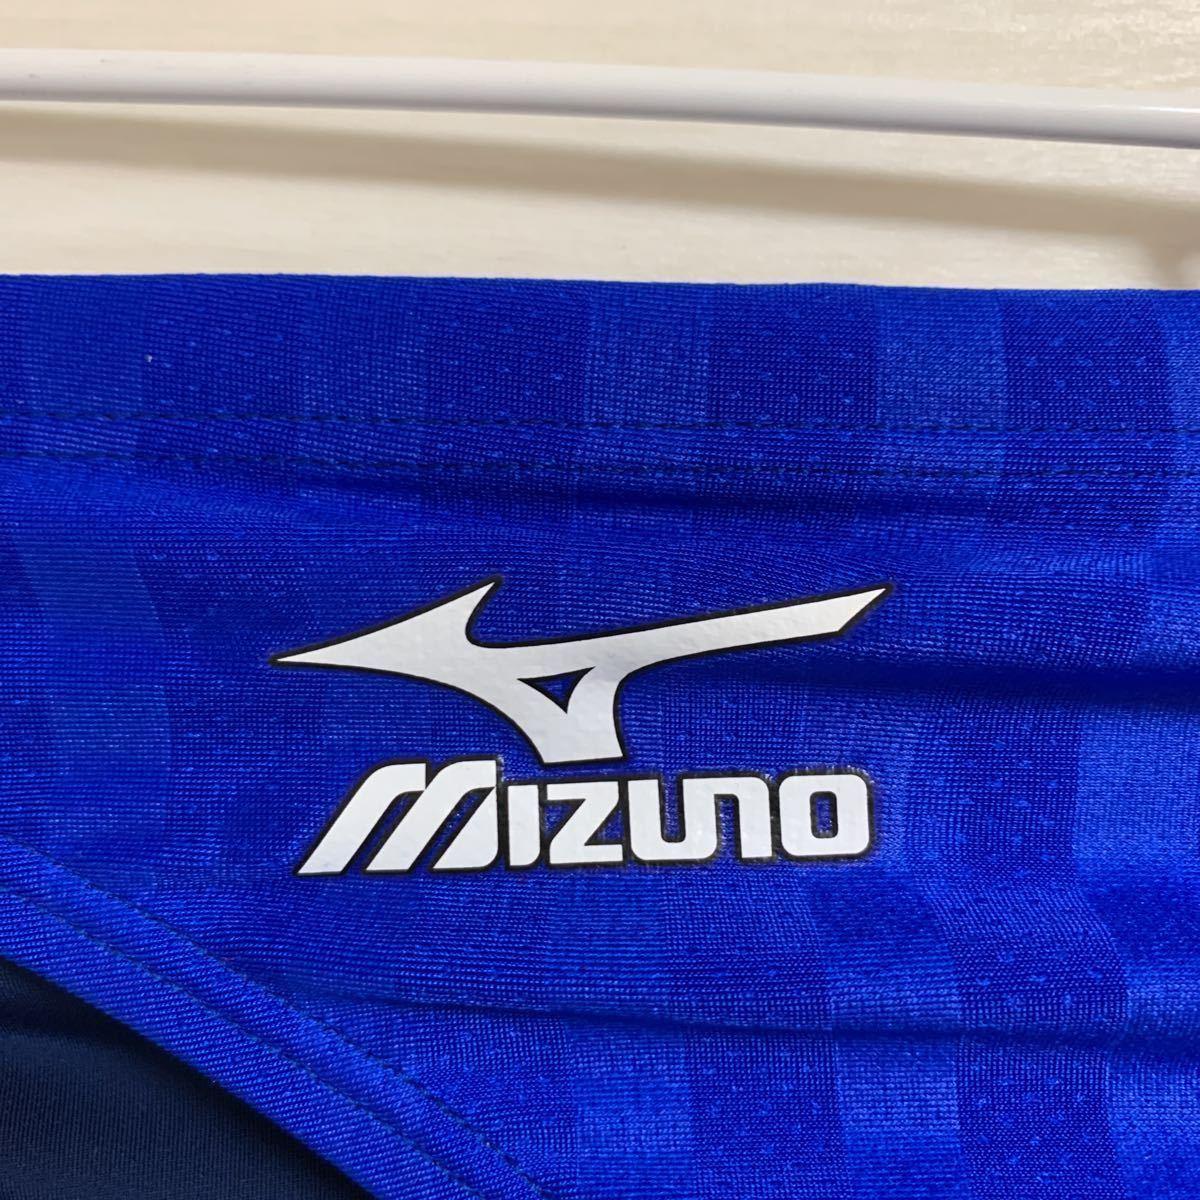 MIZUNO(ミズノ)新品(別注) XLサイズ 旧ロゴ 箱あり タグあり ストリームアクセラ 競パン Vパン ブルー/ネイビー N2JQ601100 ブーメラン_画像3